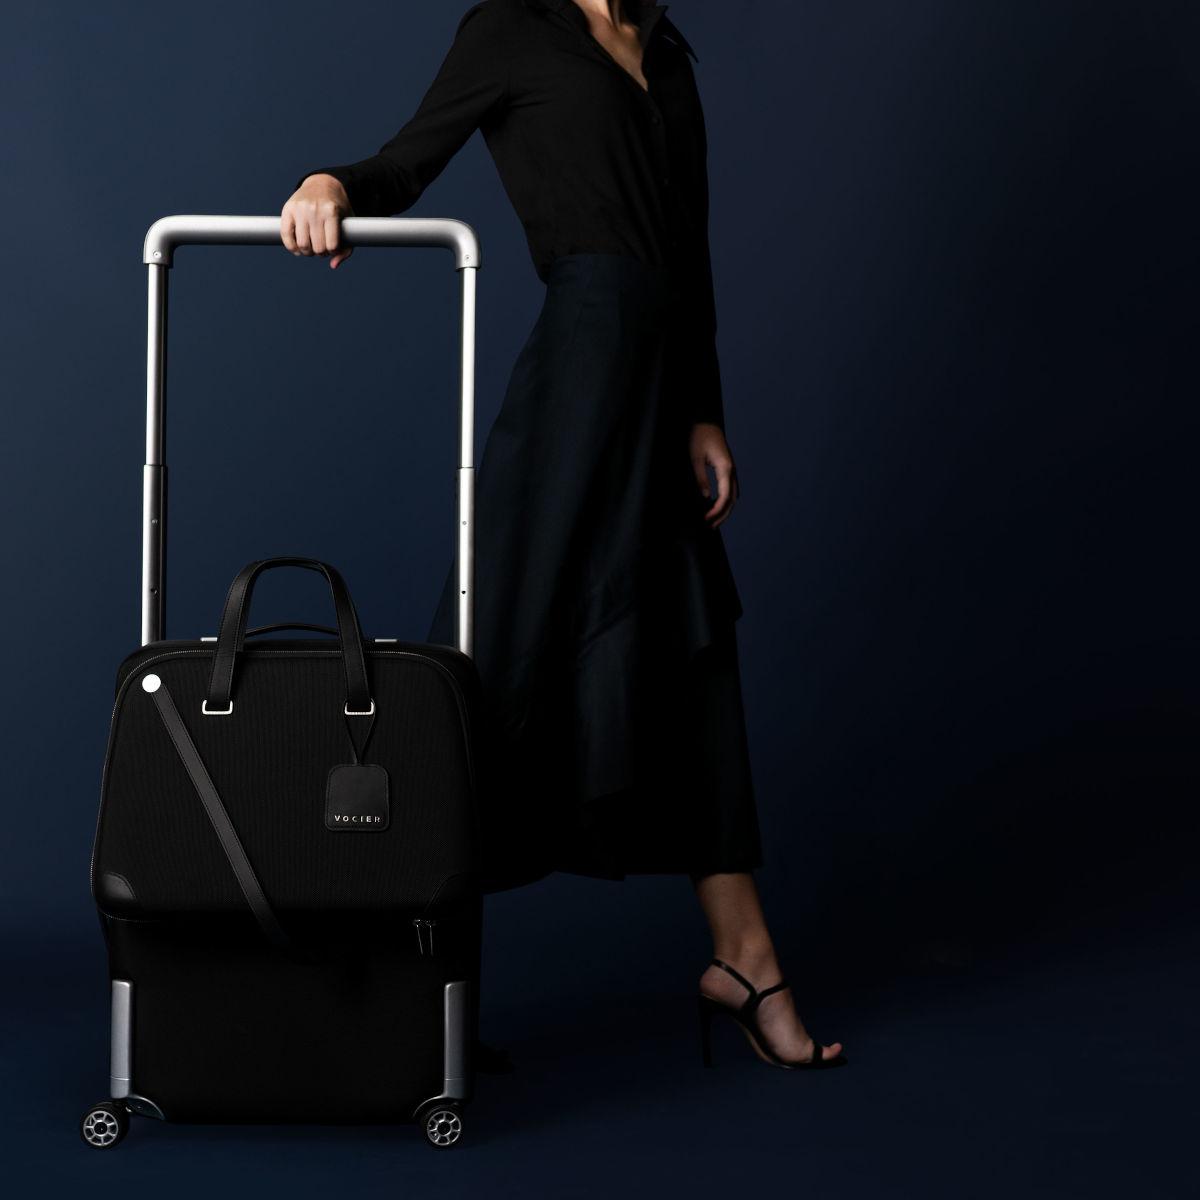 VOCIER | Innovative travel luggagefor individual requirements